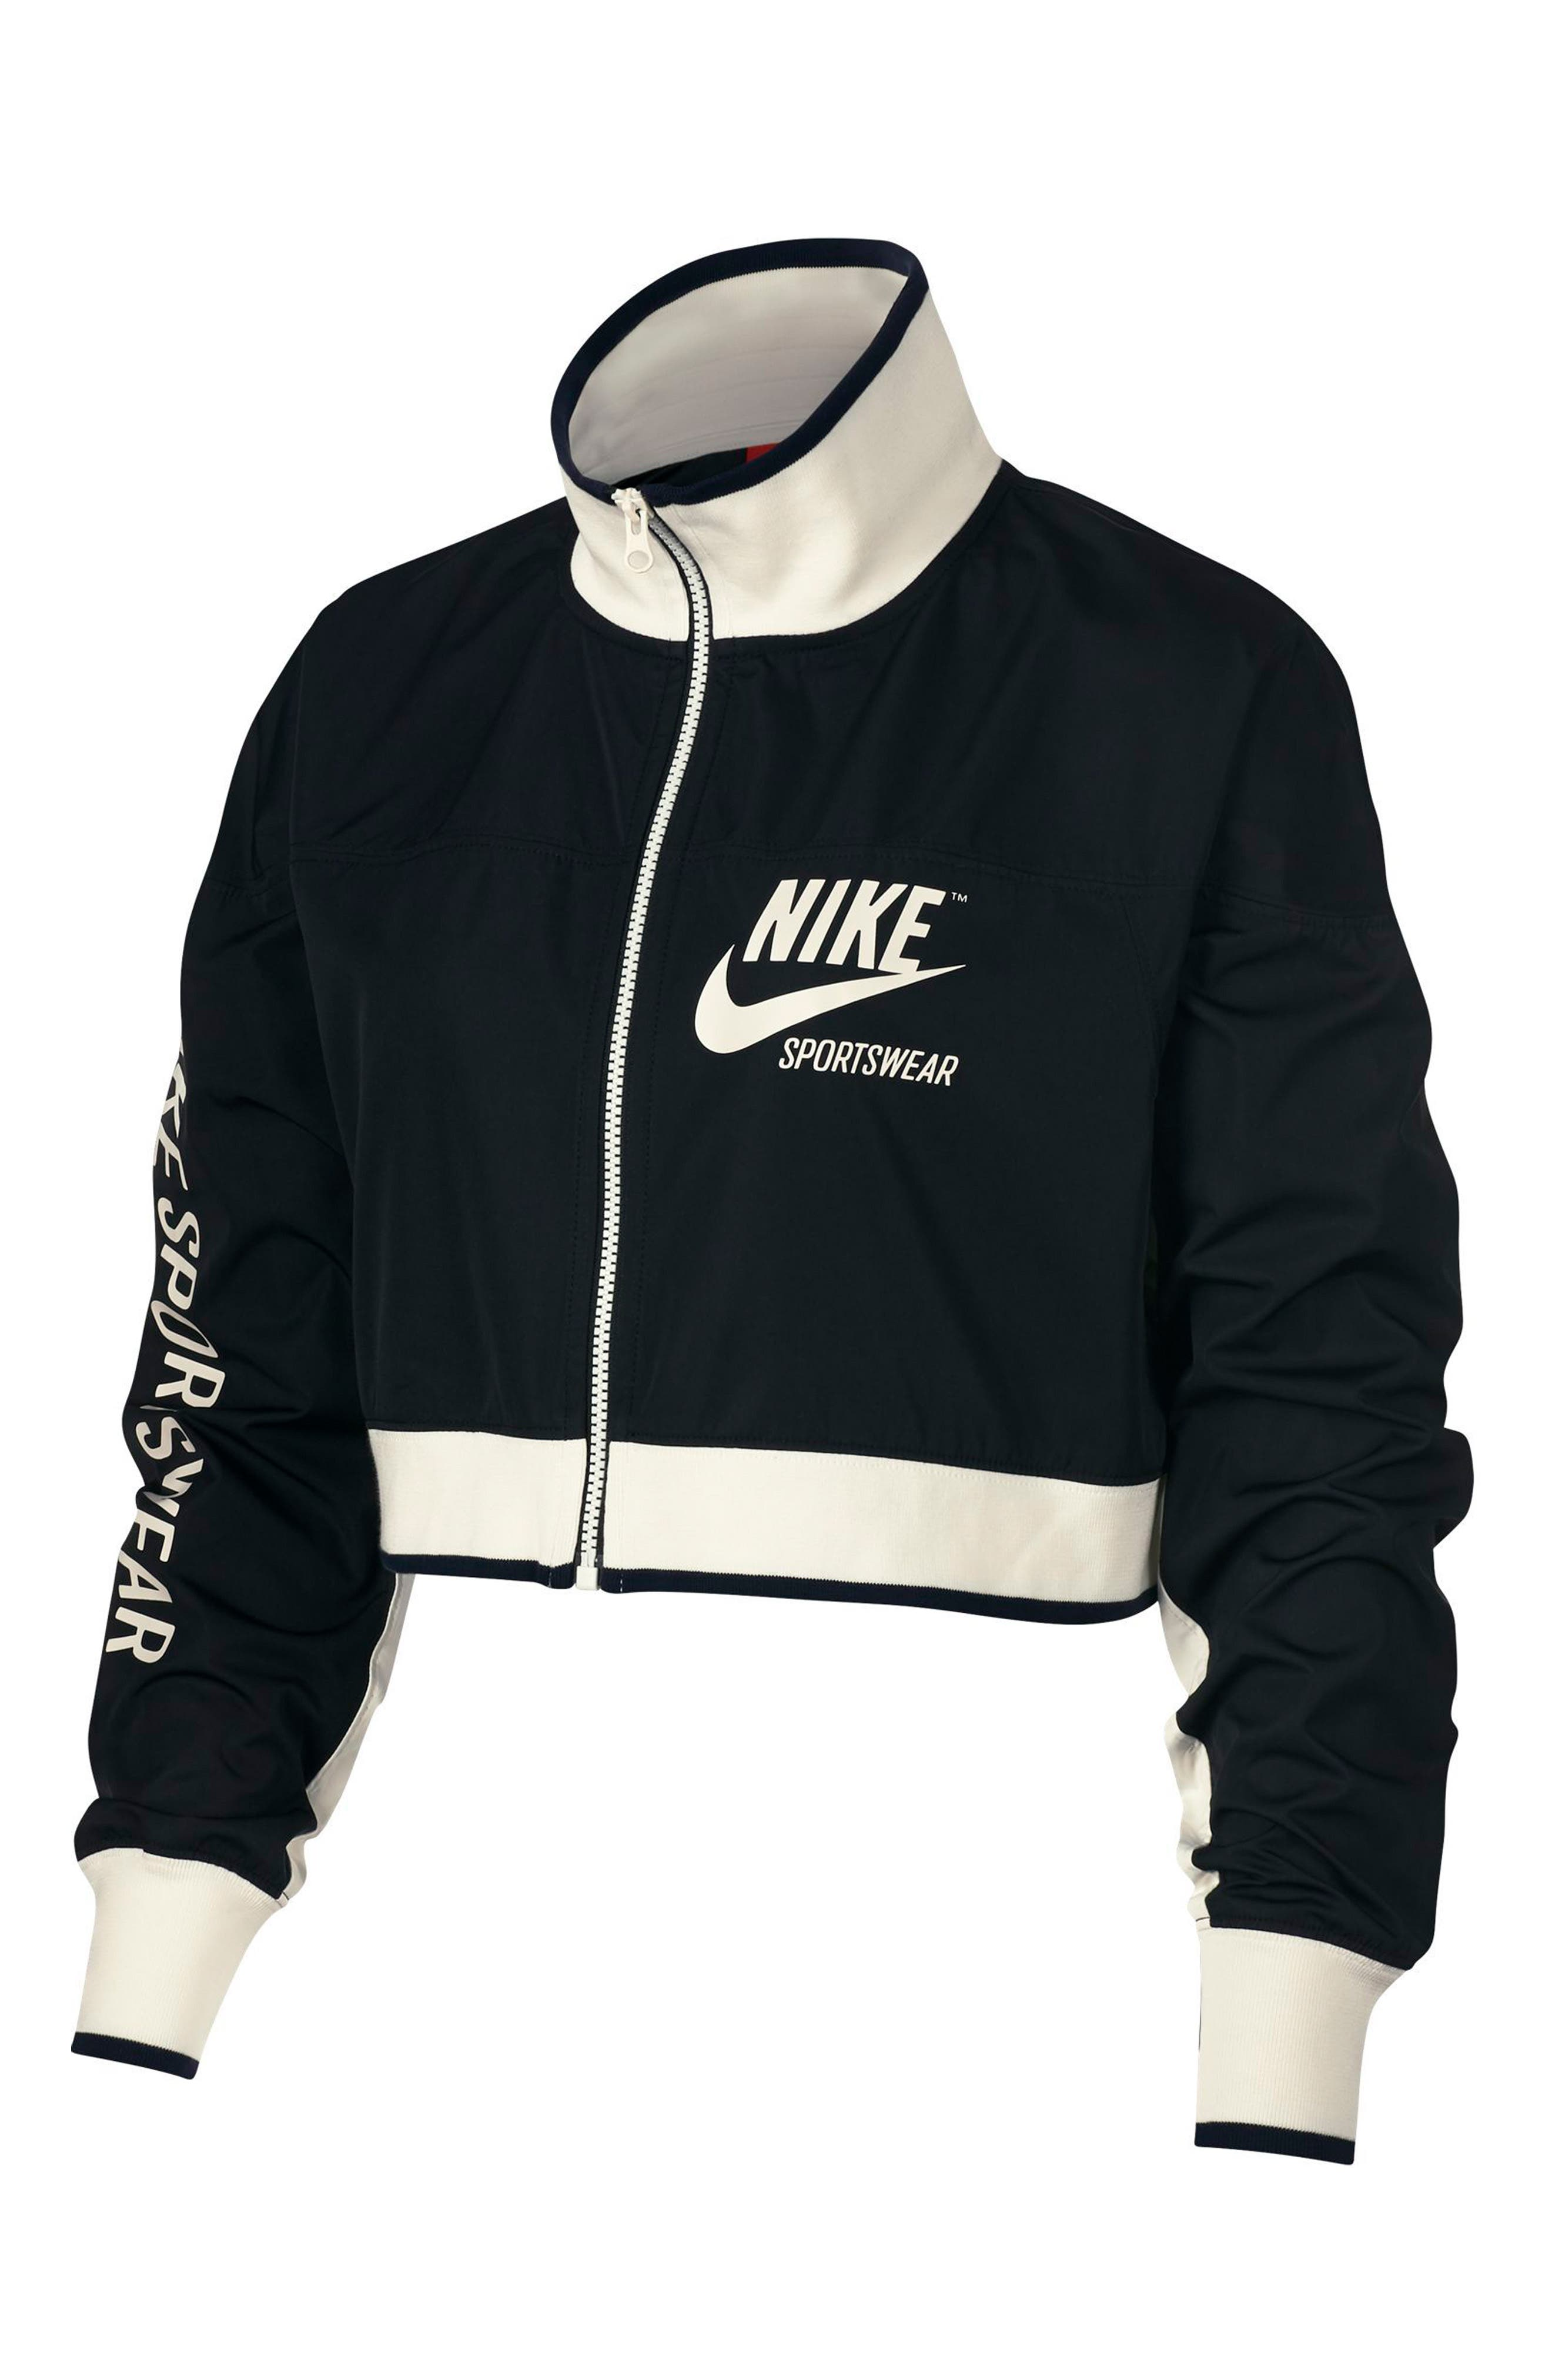 Sportswear Archive Women's Track Jacket,                             Main thumbnail 1, color,                             Black/ Black/ Sail/ Sail